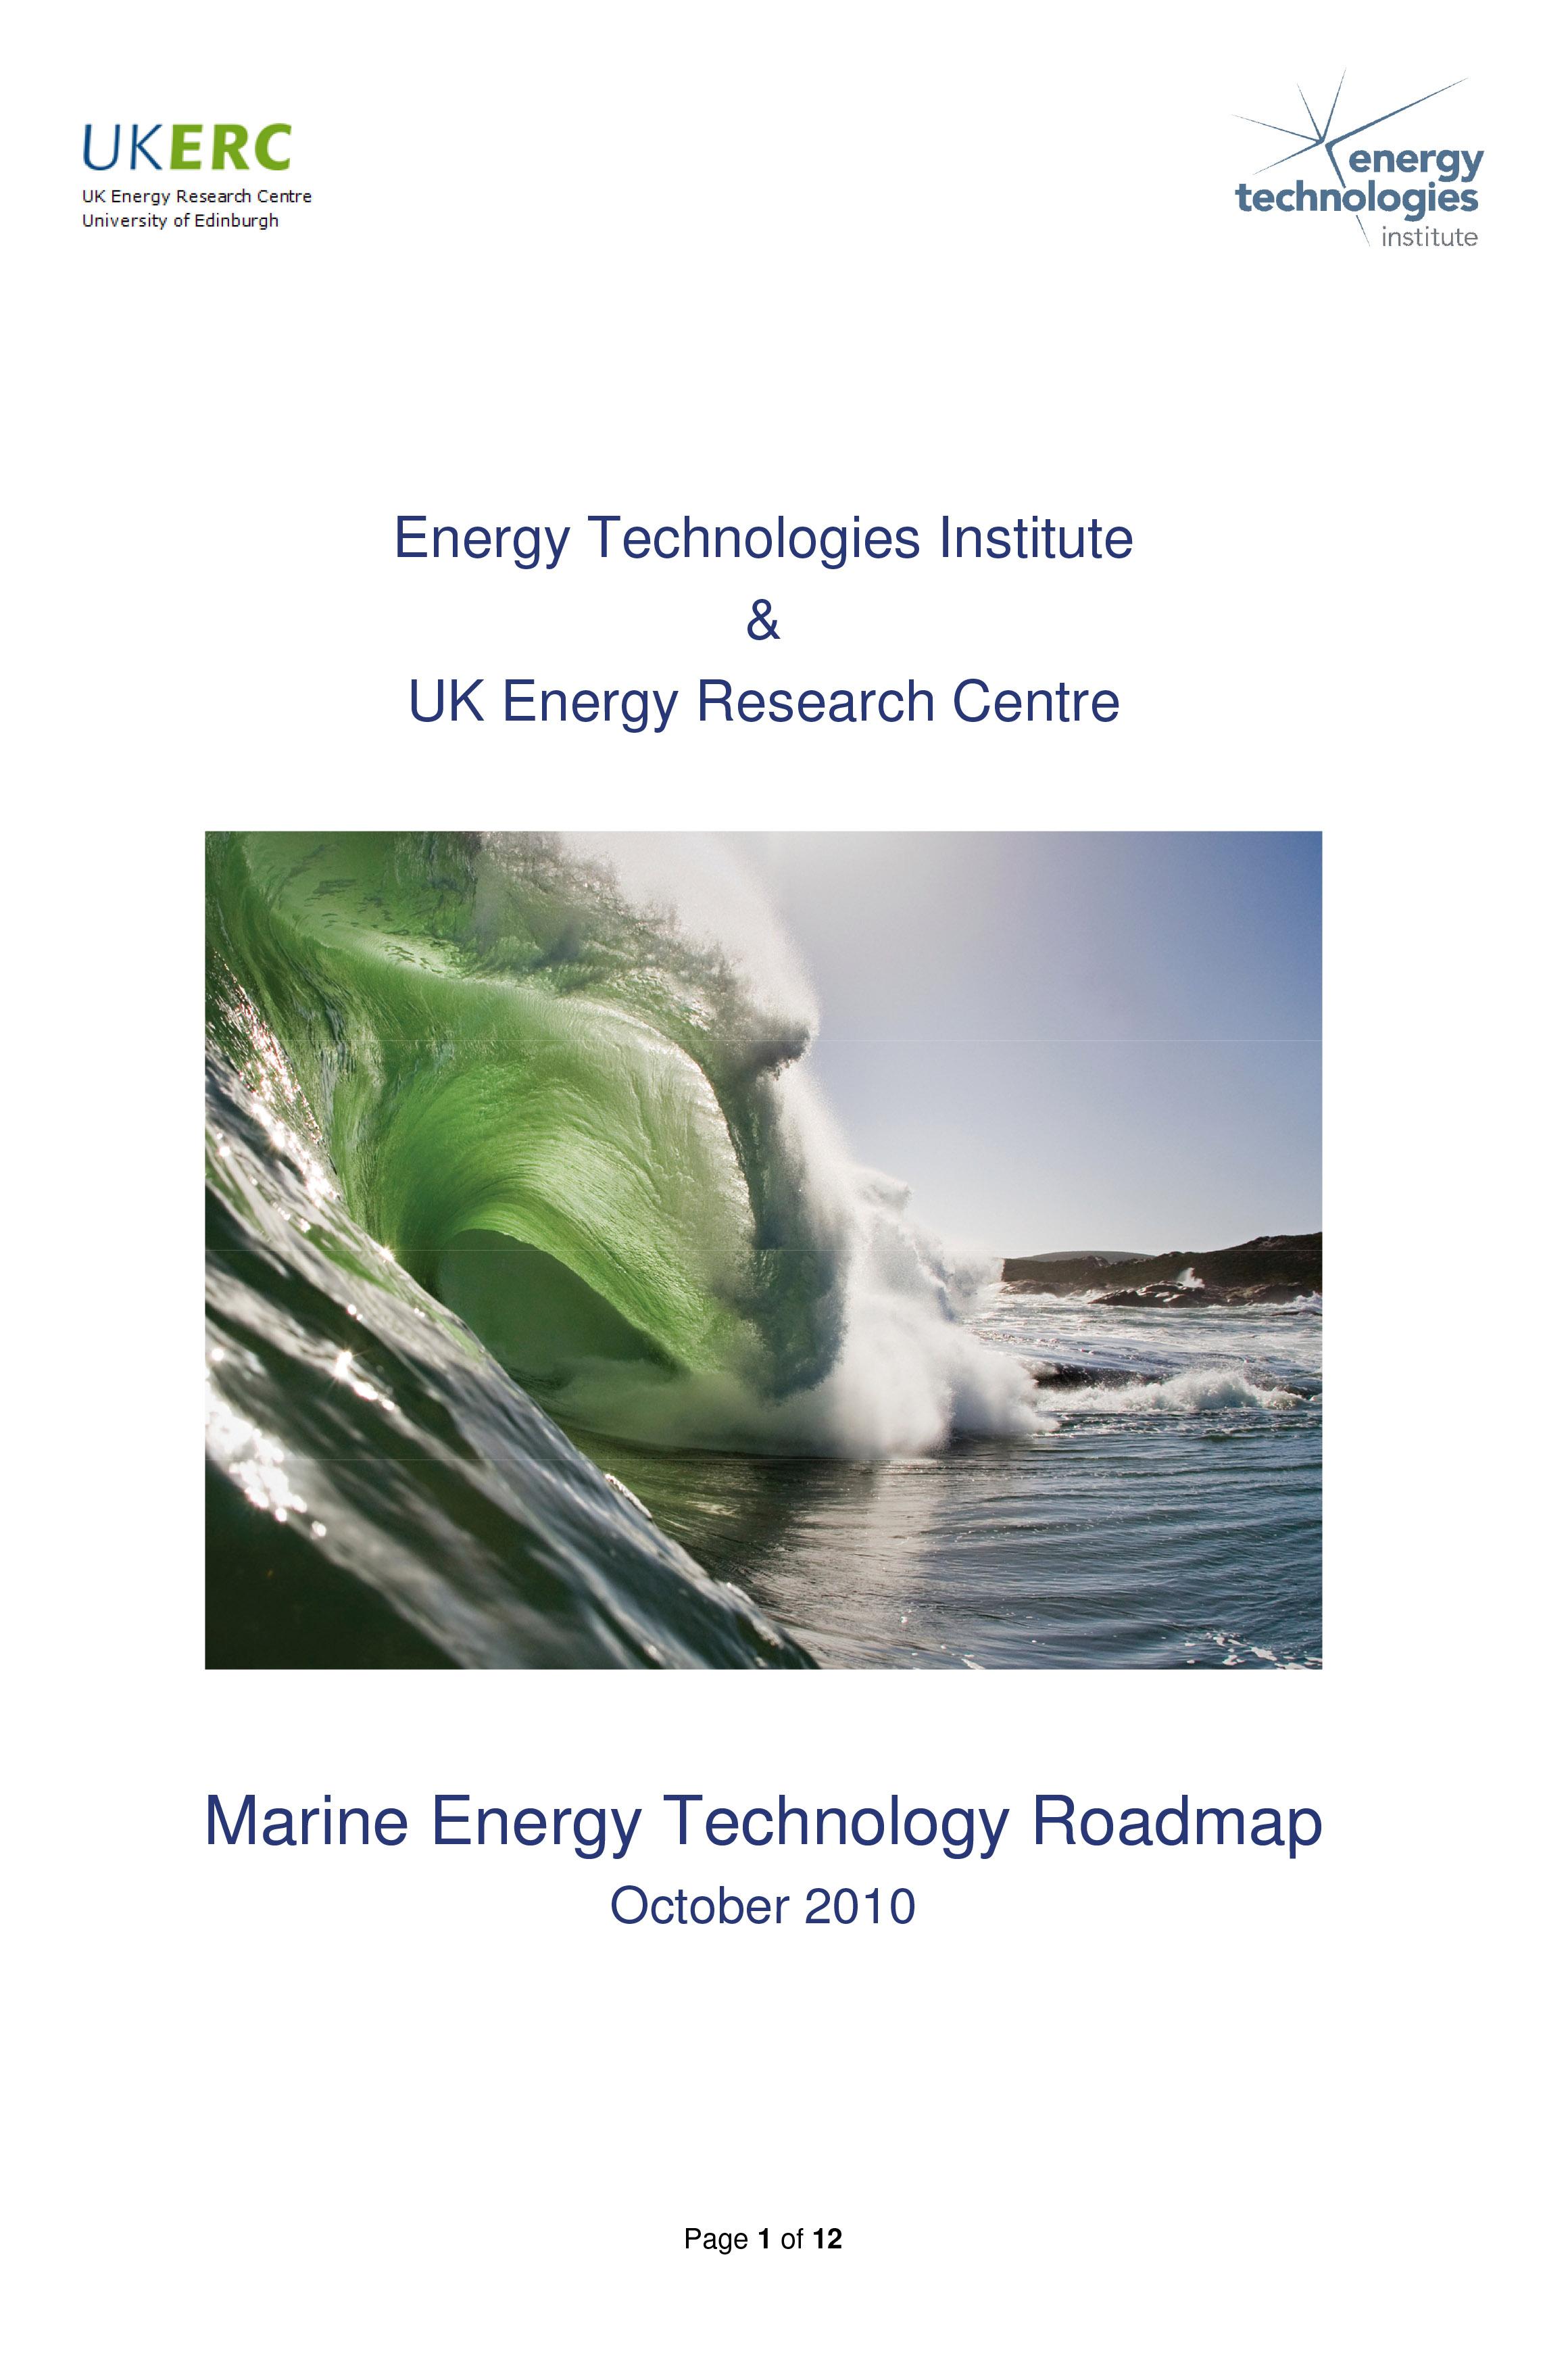 Marine Energy Technology Roadmap (2010)